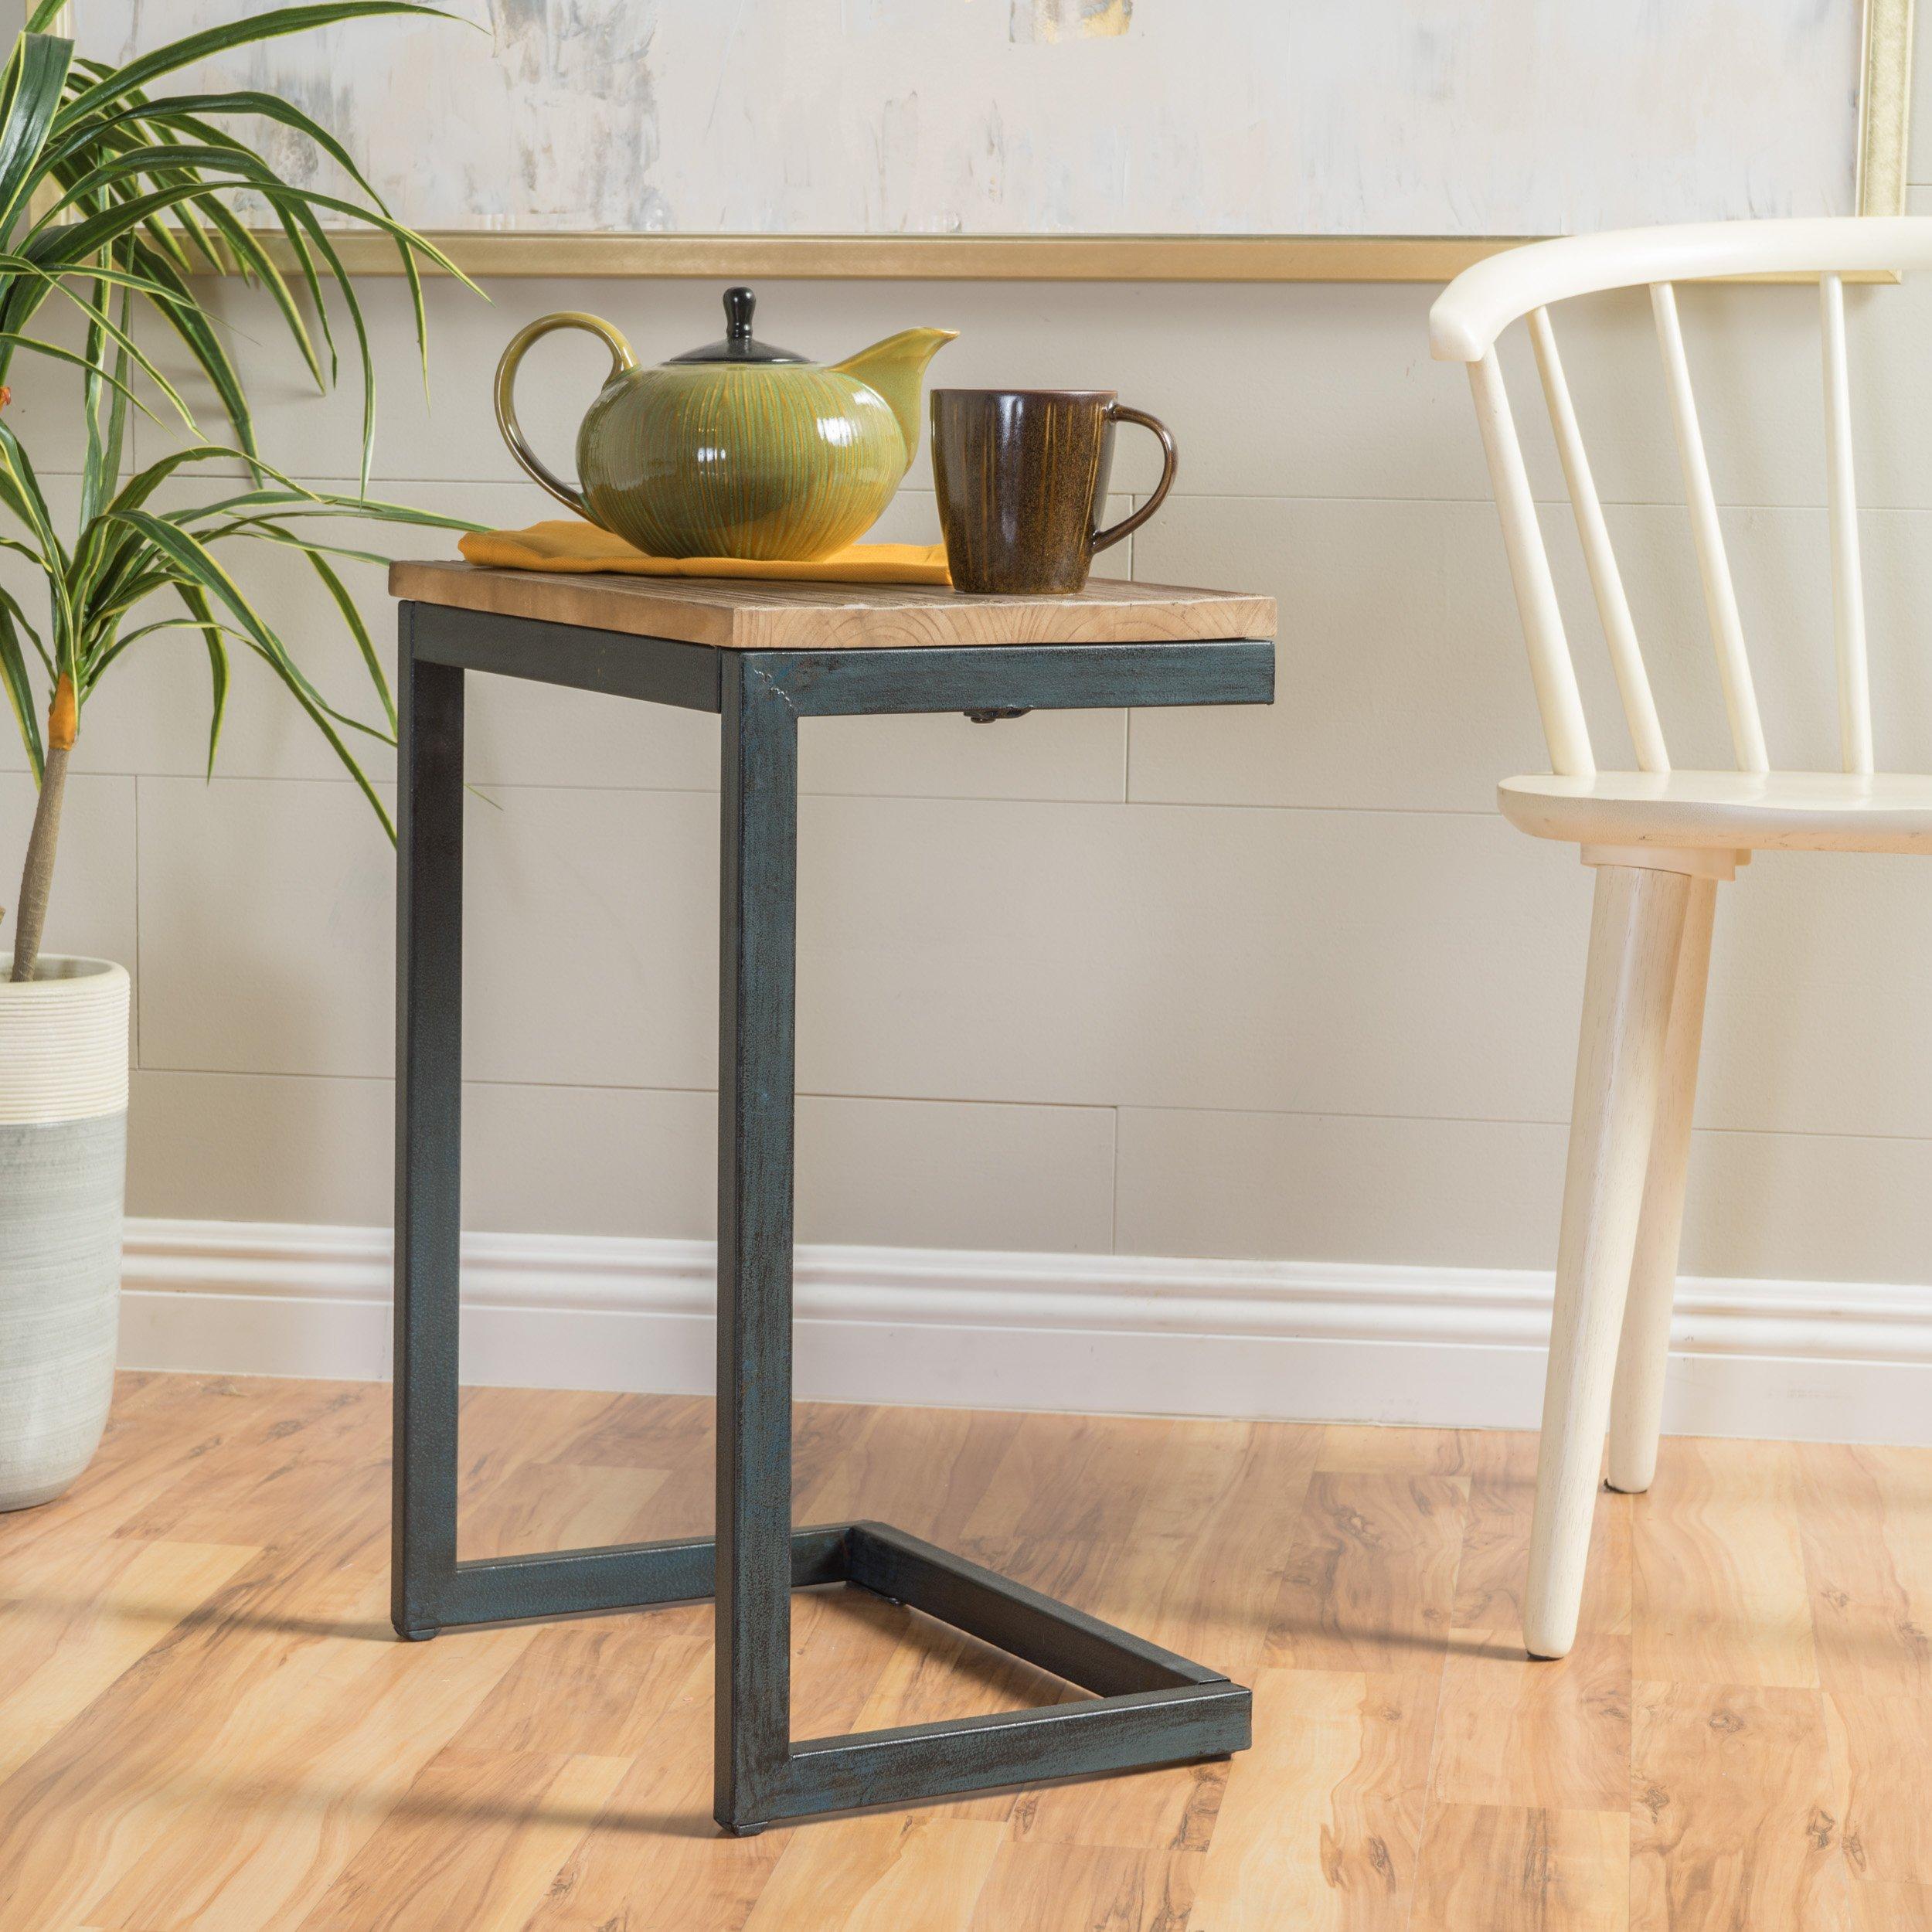 Ramona Medium Fir Wood Antique Table